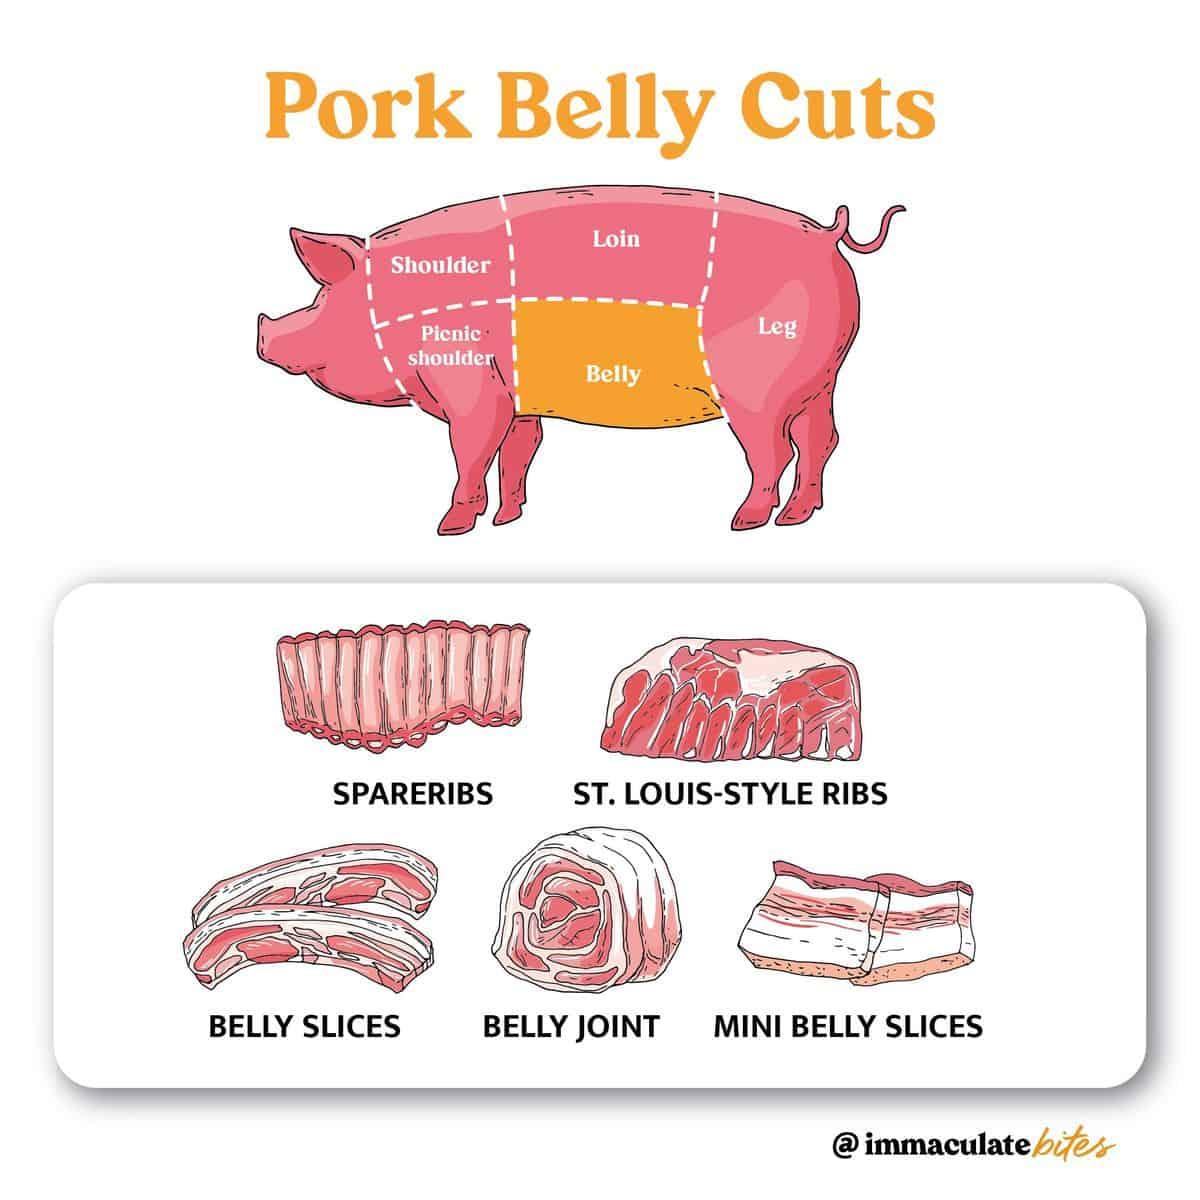 Pork Belly Cuts